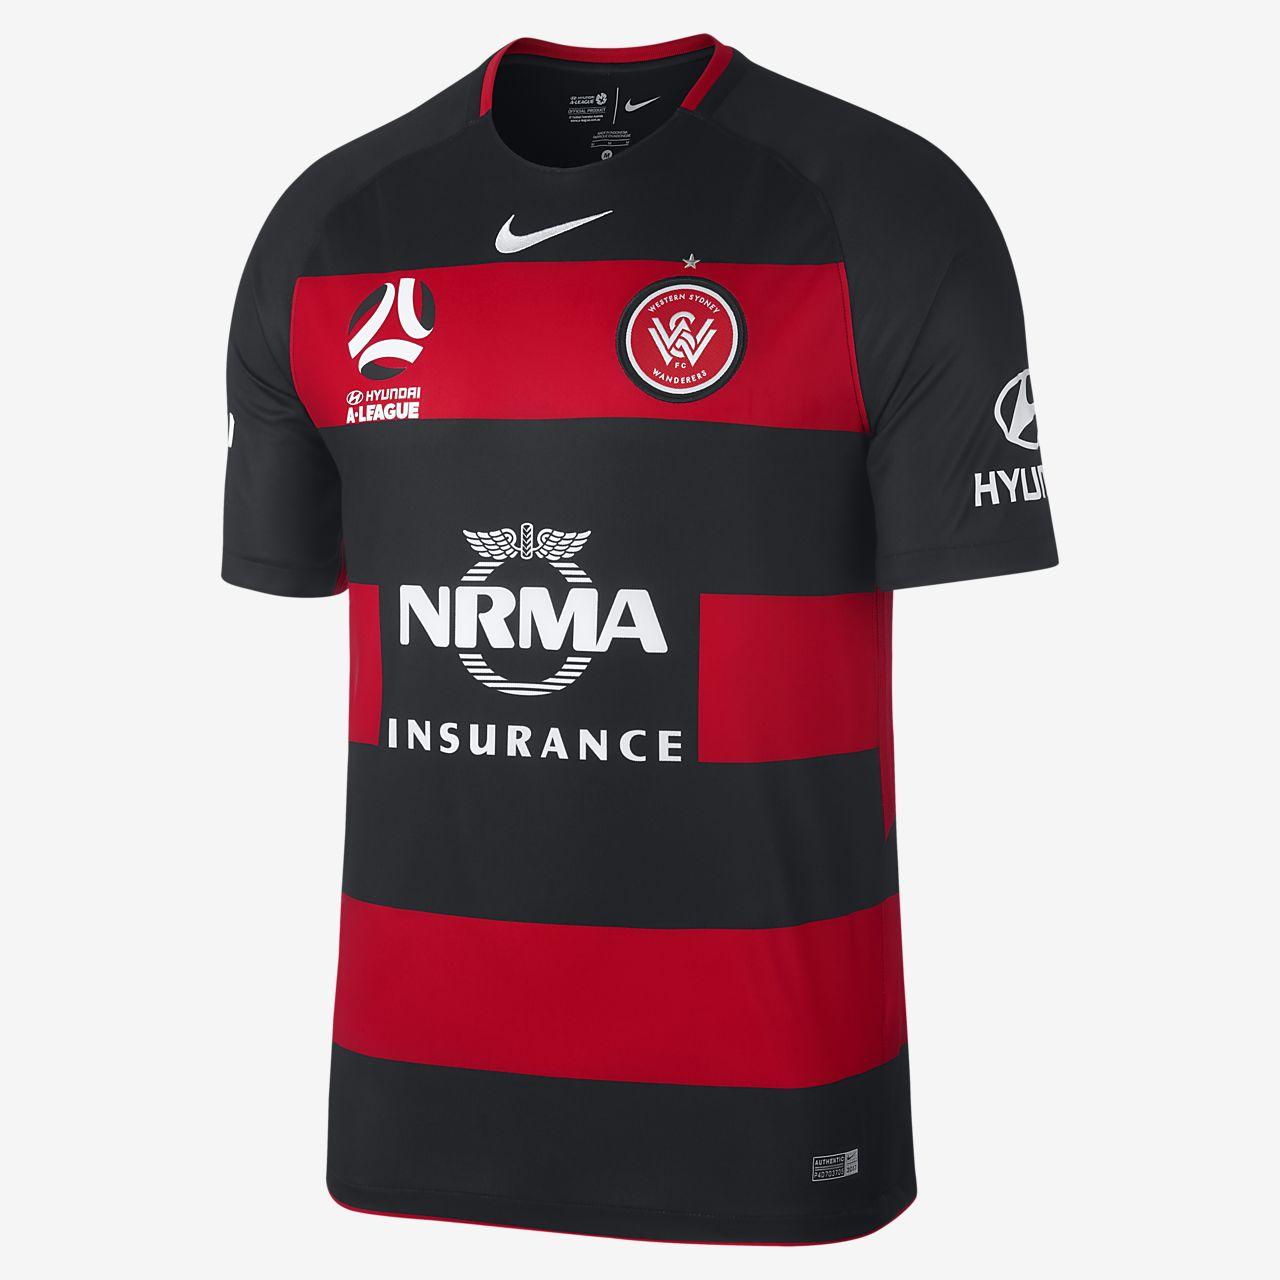 0d425f2a Home fotballdrakt Stadium FC Sydney for Nike herre 201718 Western qH1ZI